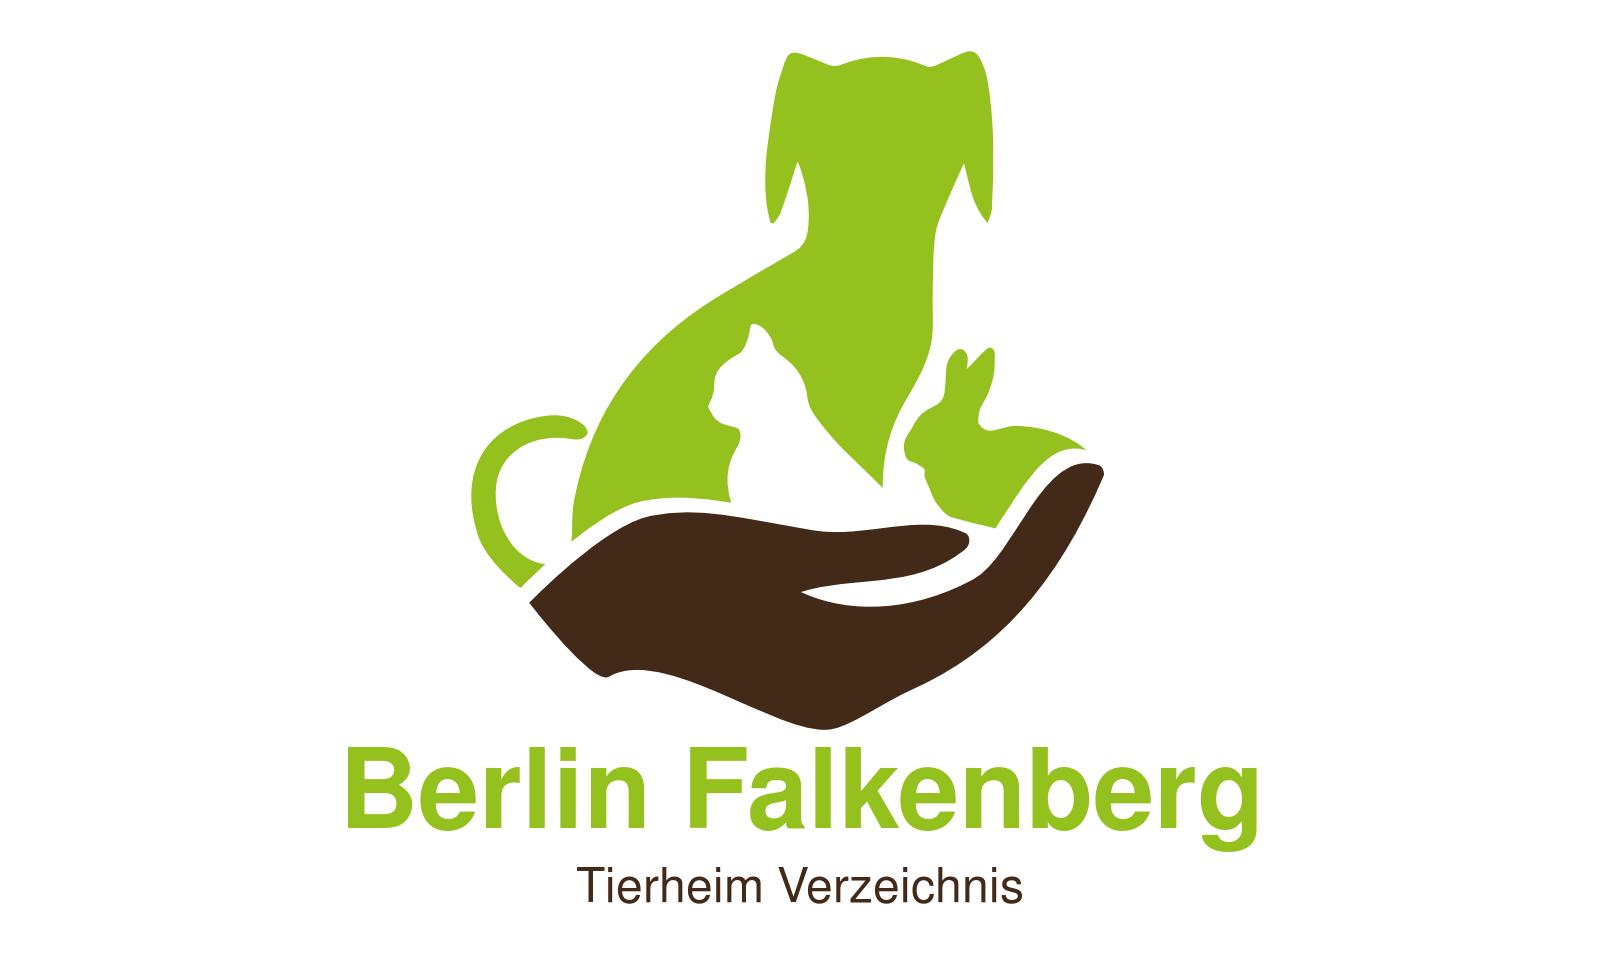 Tierheim Berlin Falkenberg